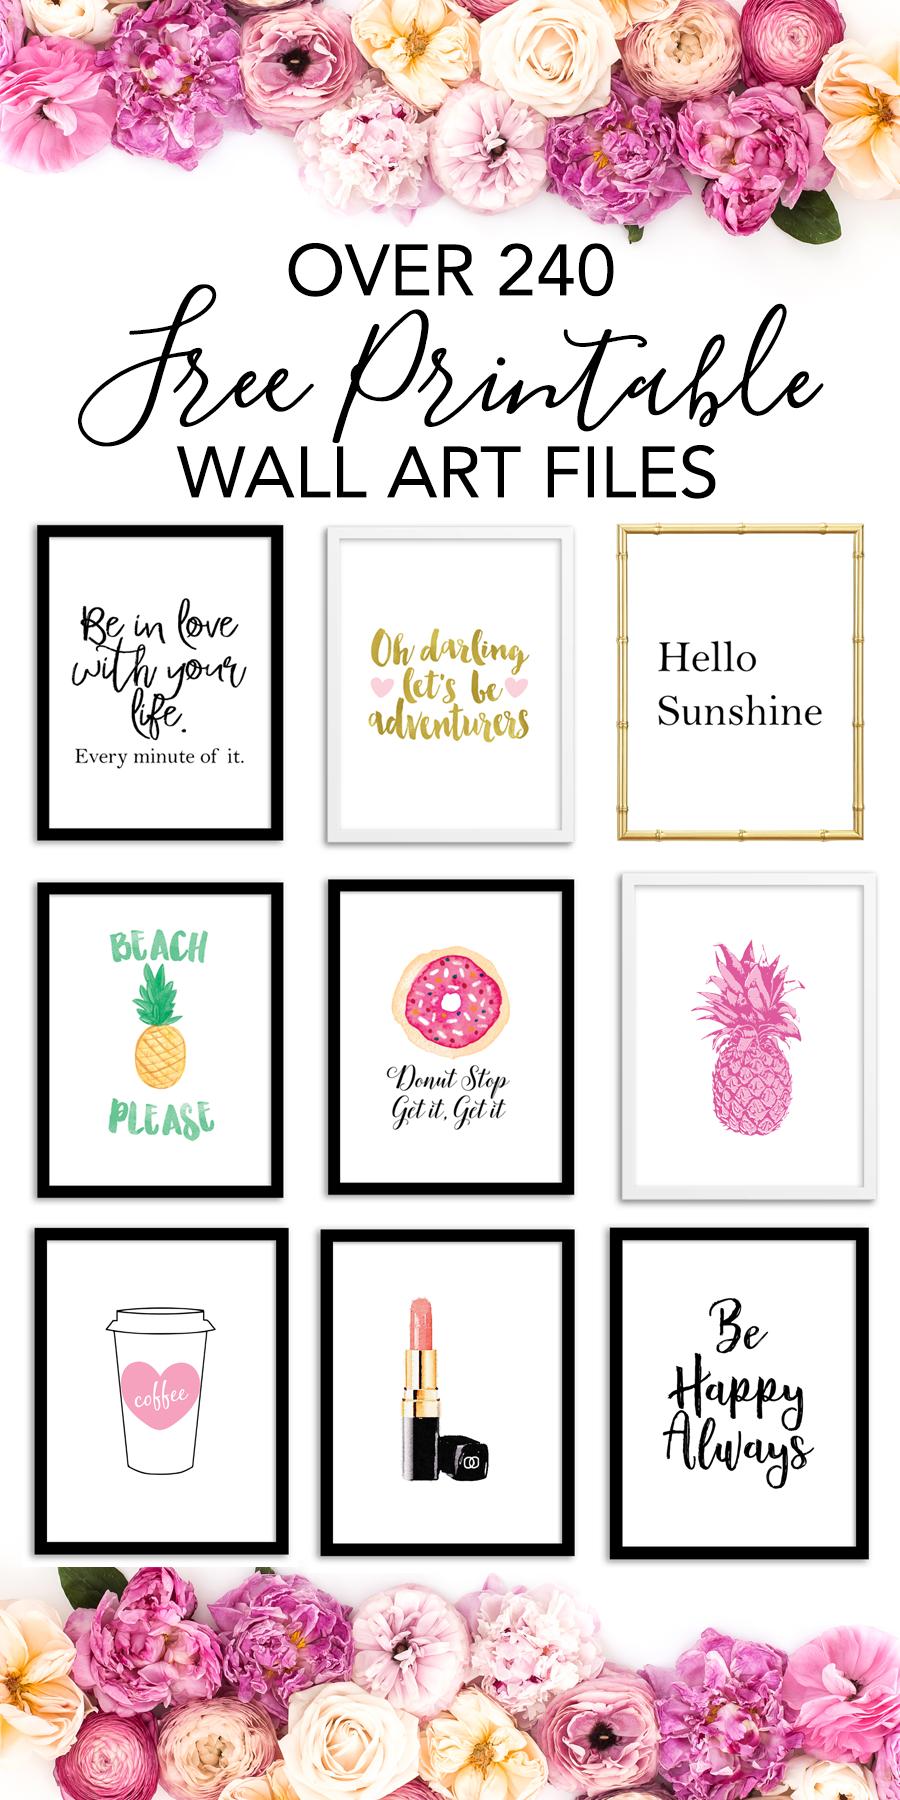 Free Printable Wall Art Choose From Over 240 Printable Art Prints To Print For Home Decor Offic Free Printable Wall Art Wall Printables Printable Art Prints